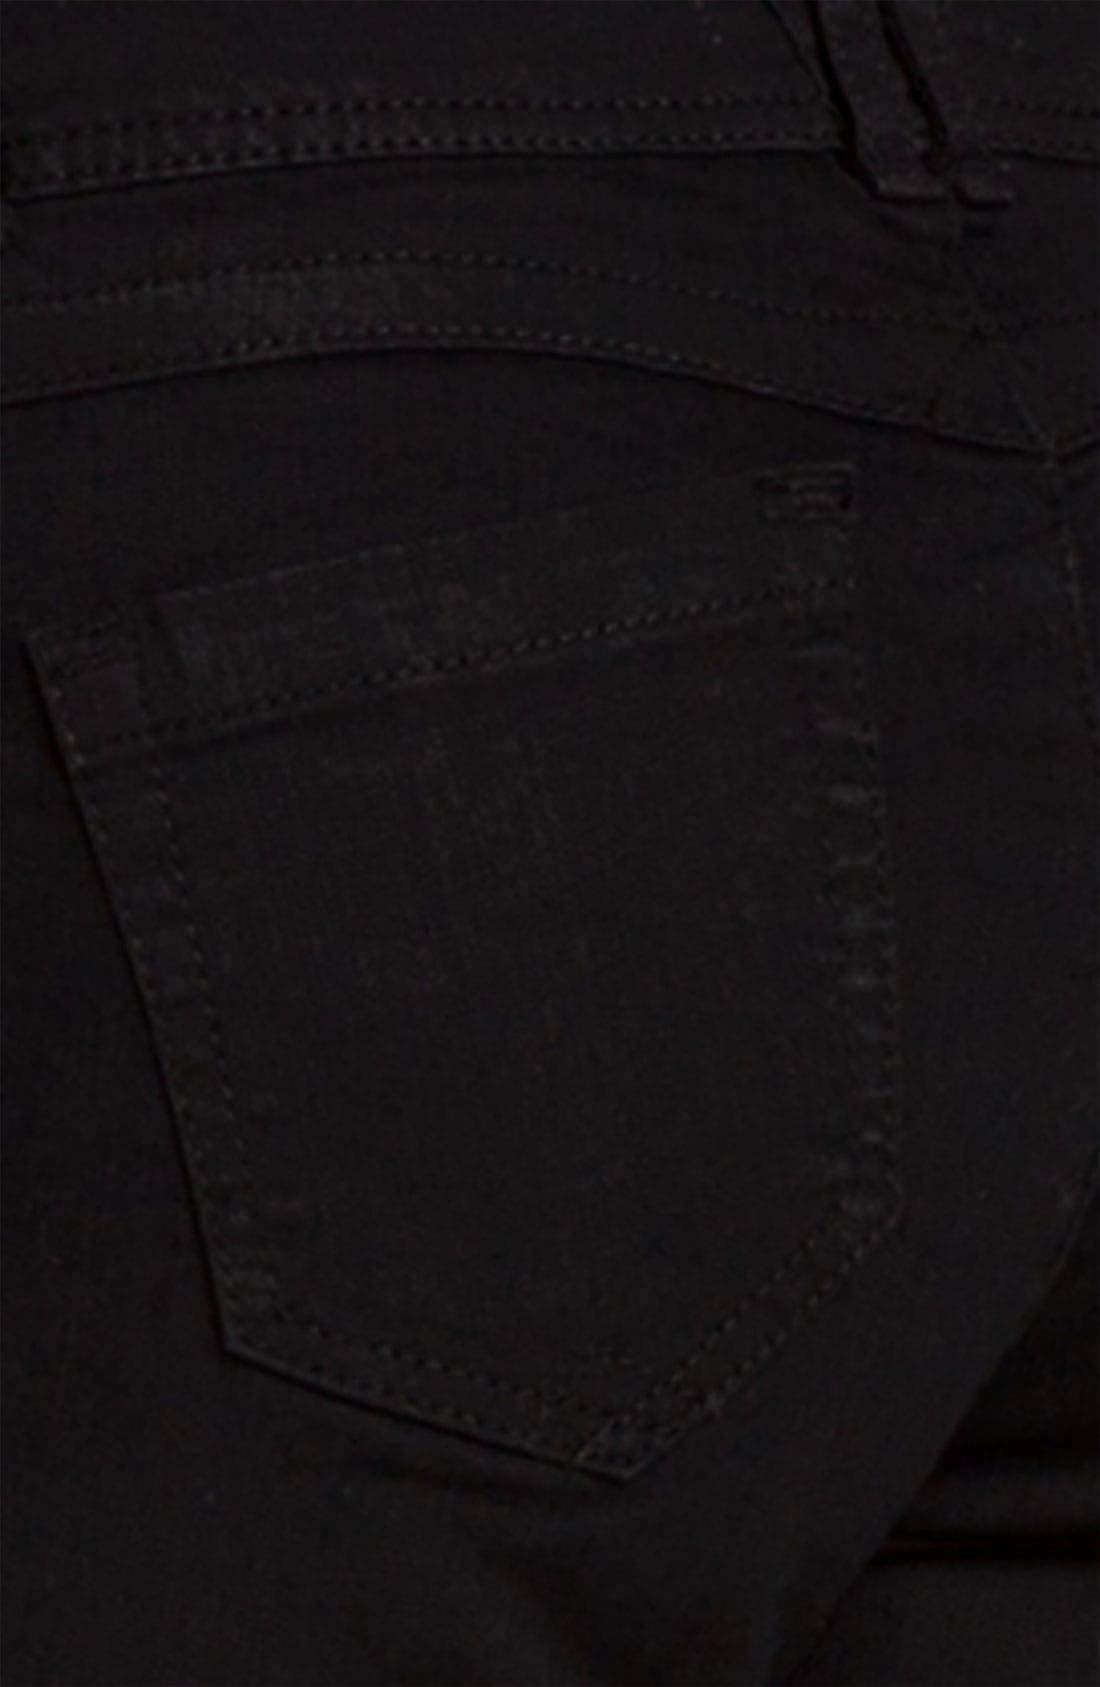 Alternate Image 3  - Wit & Wisdom Denim Leggings (Black Wash) (Nordstrom Exclusive)